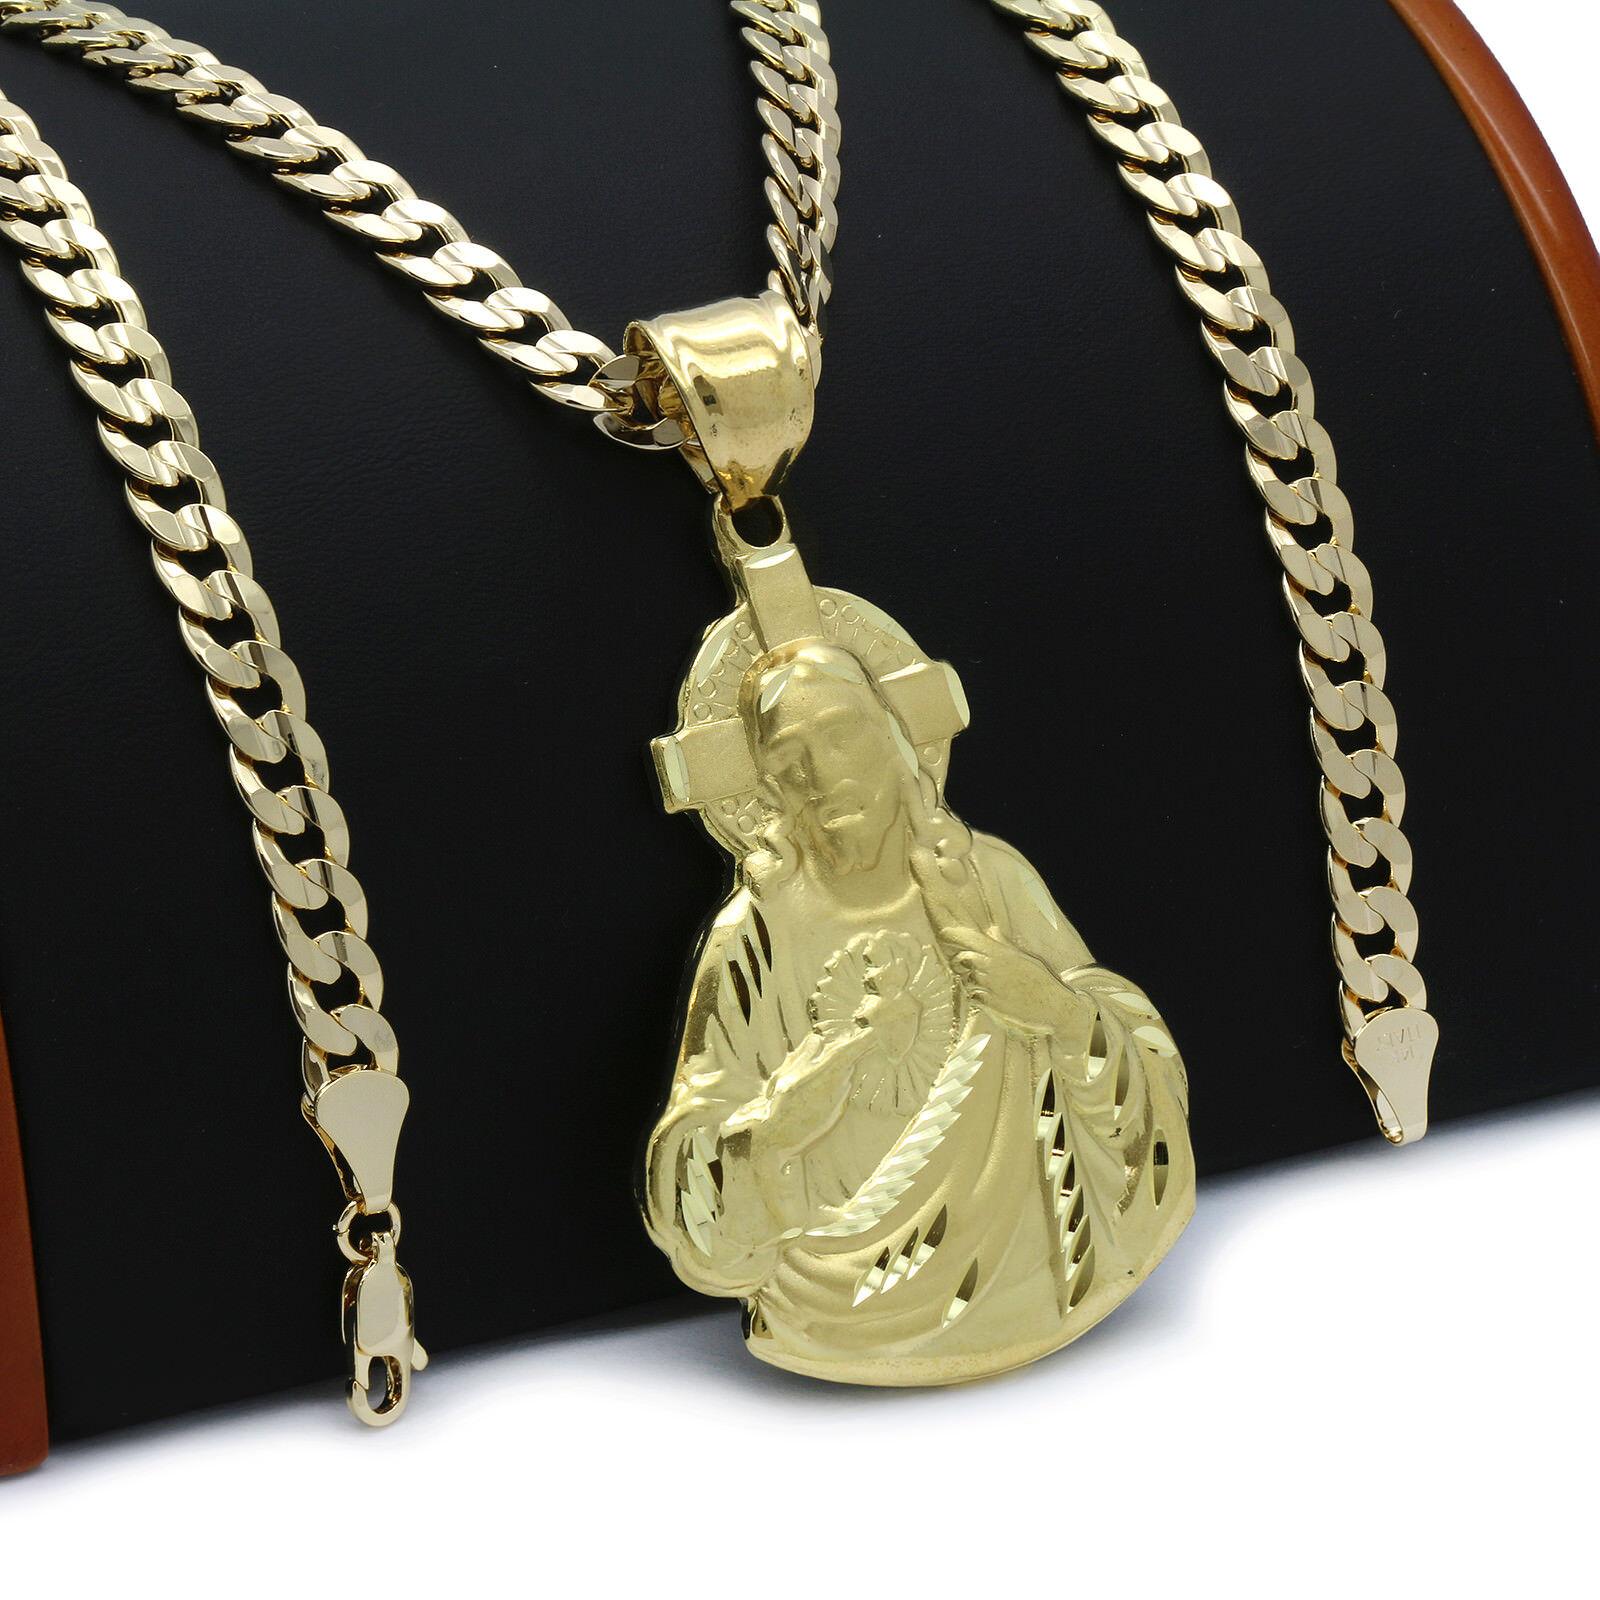 Mens 18k Gold Plated JESUS Hip-Hop Pendant 6mm Cuban Chain N